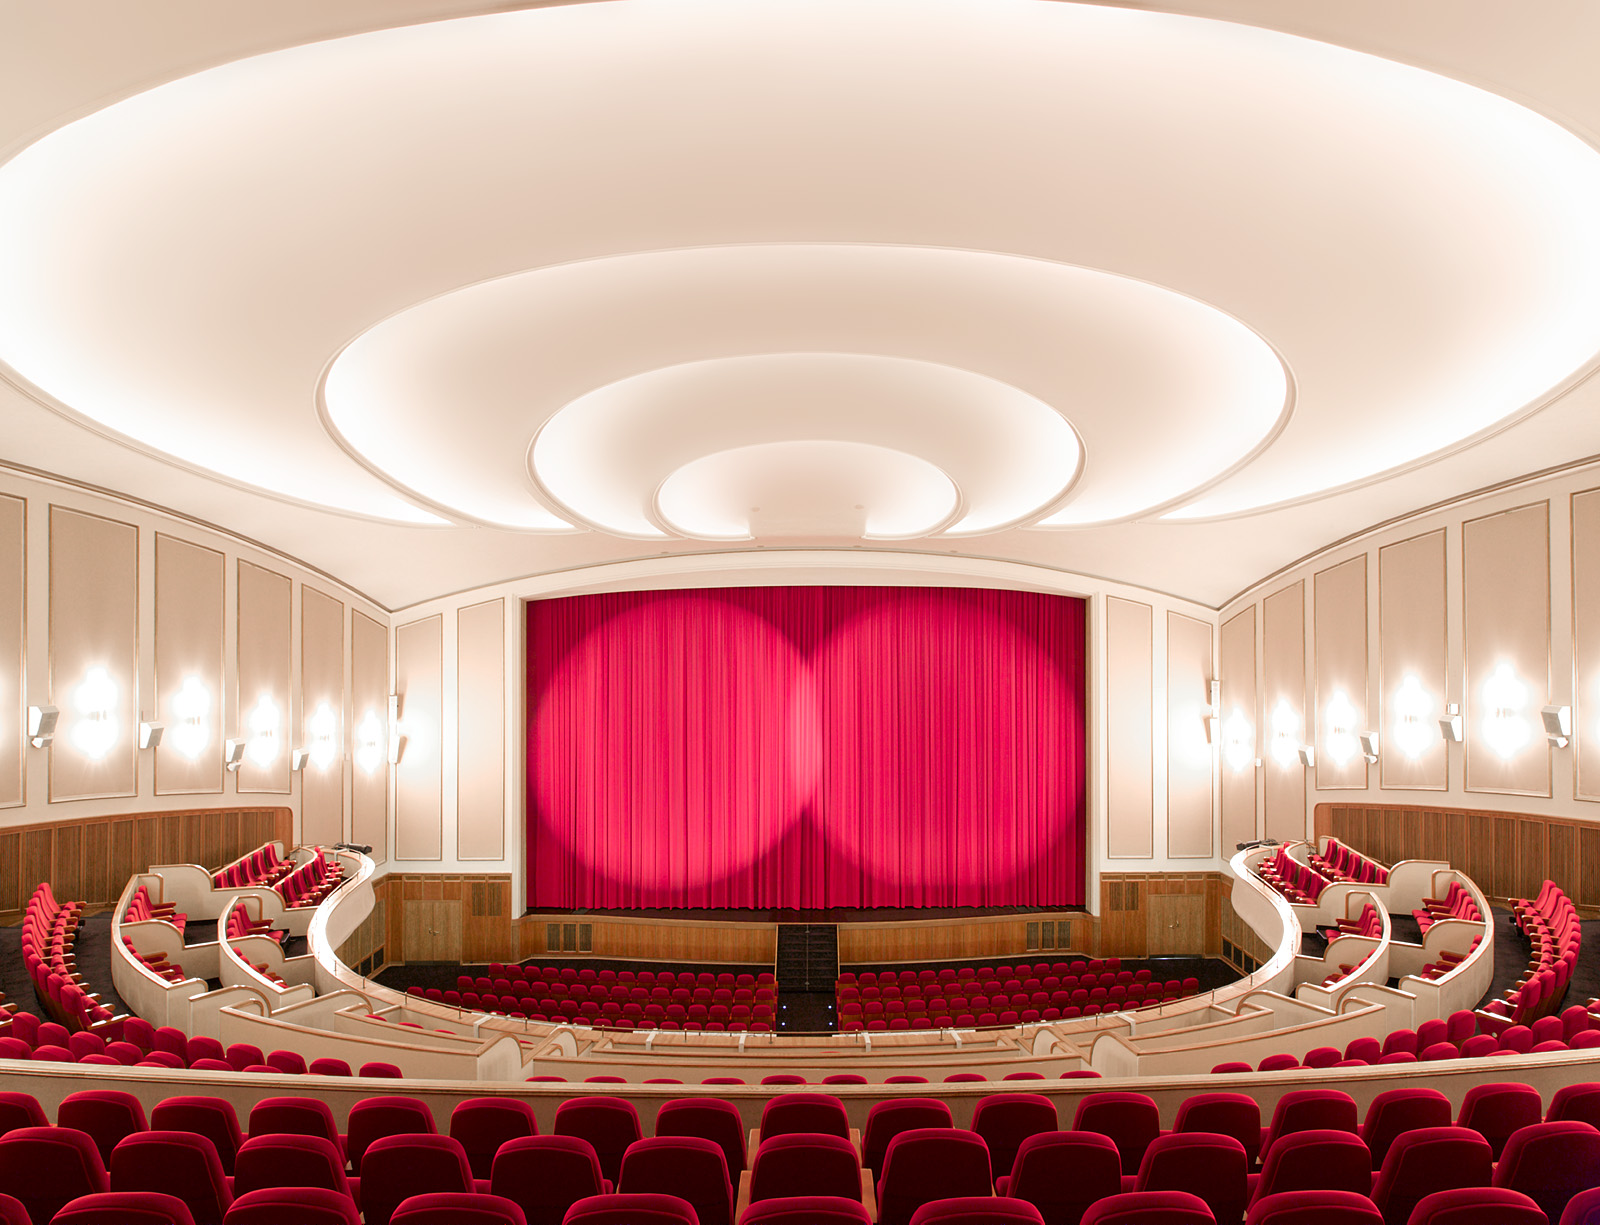 Kino Lichtburg